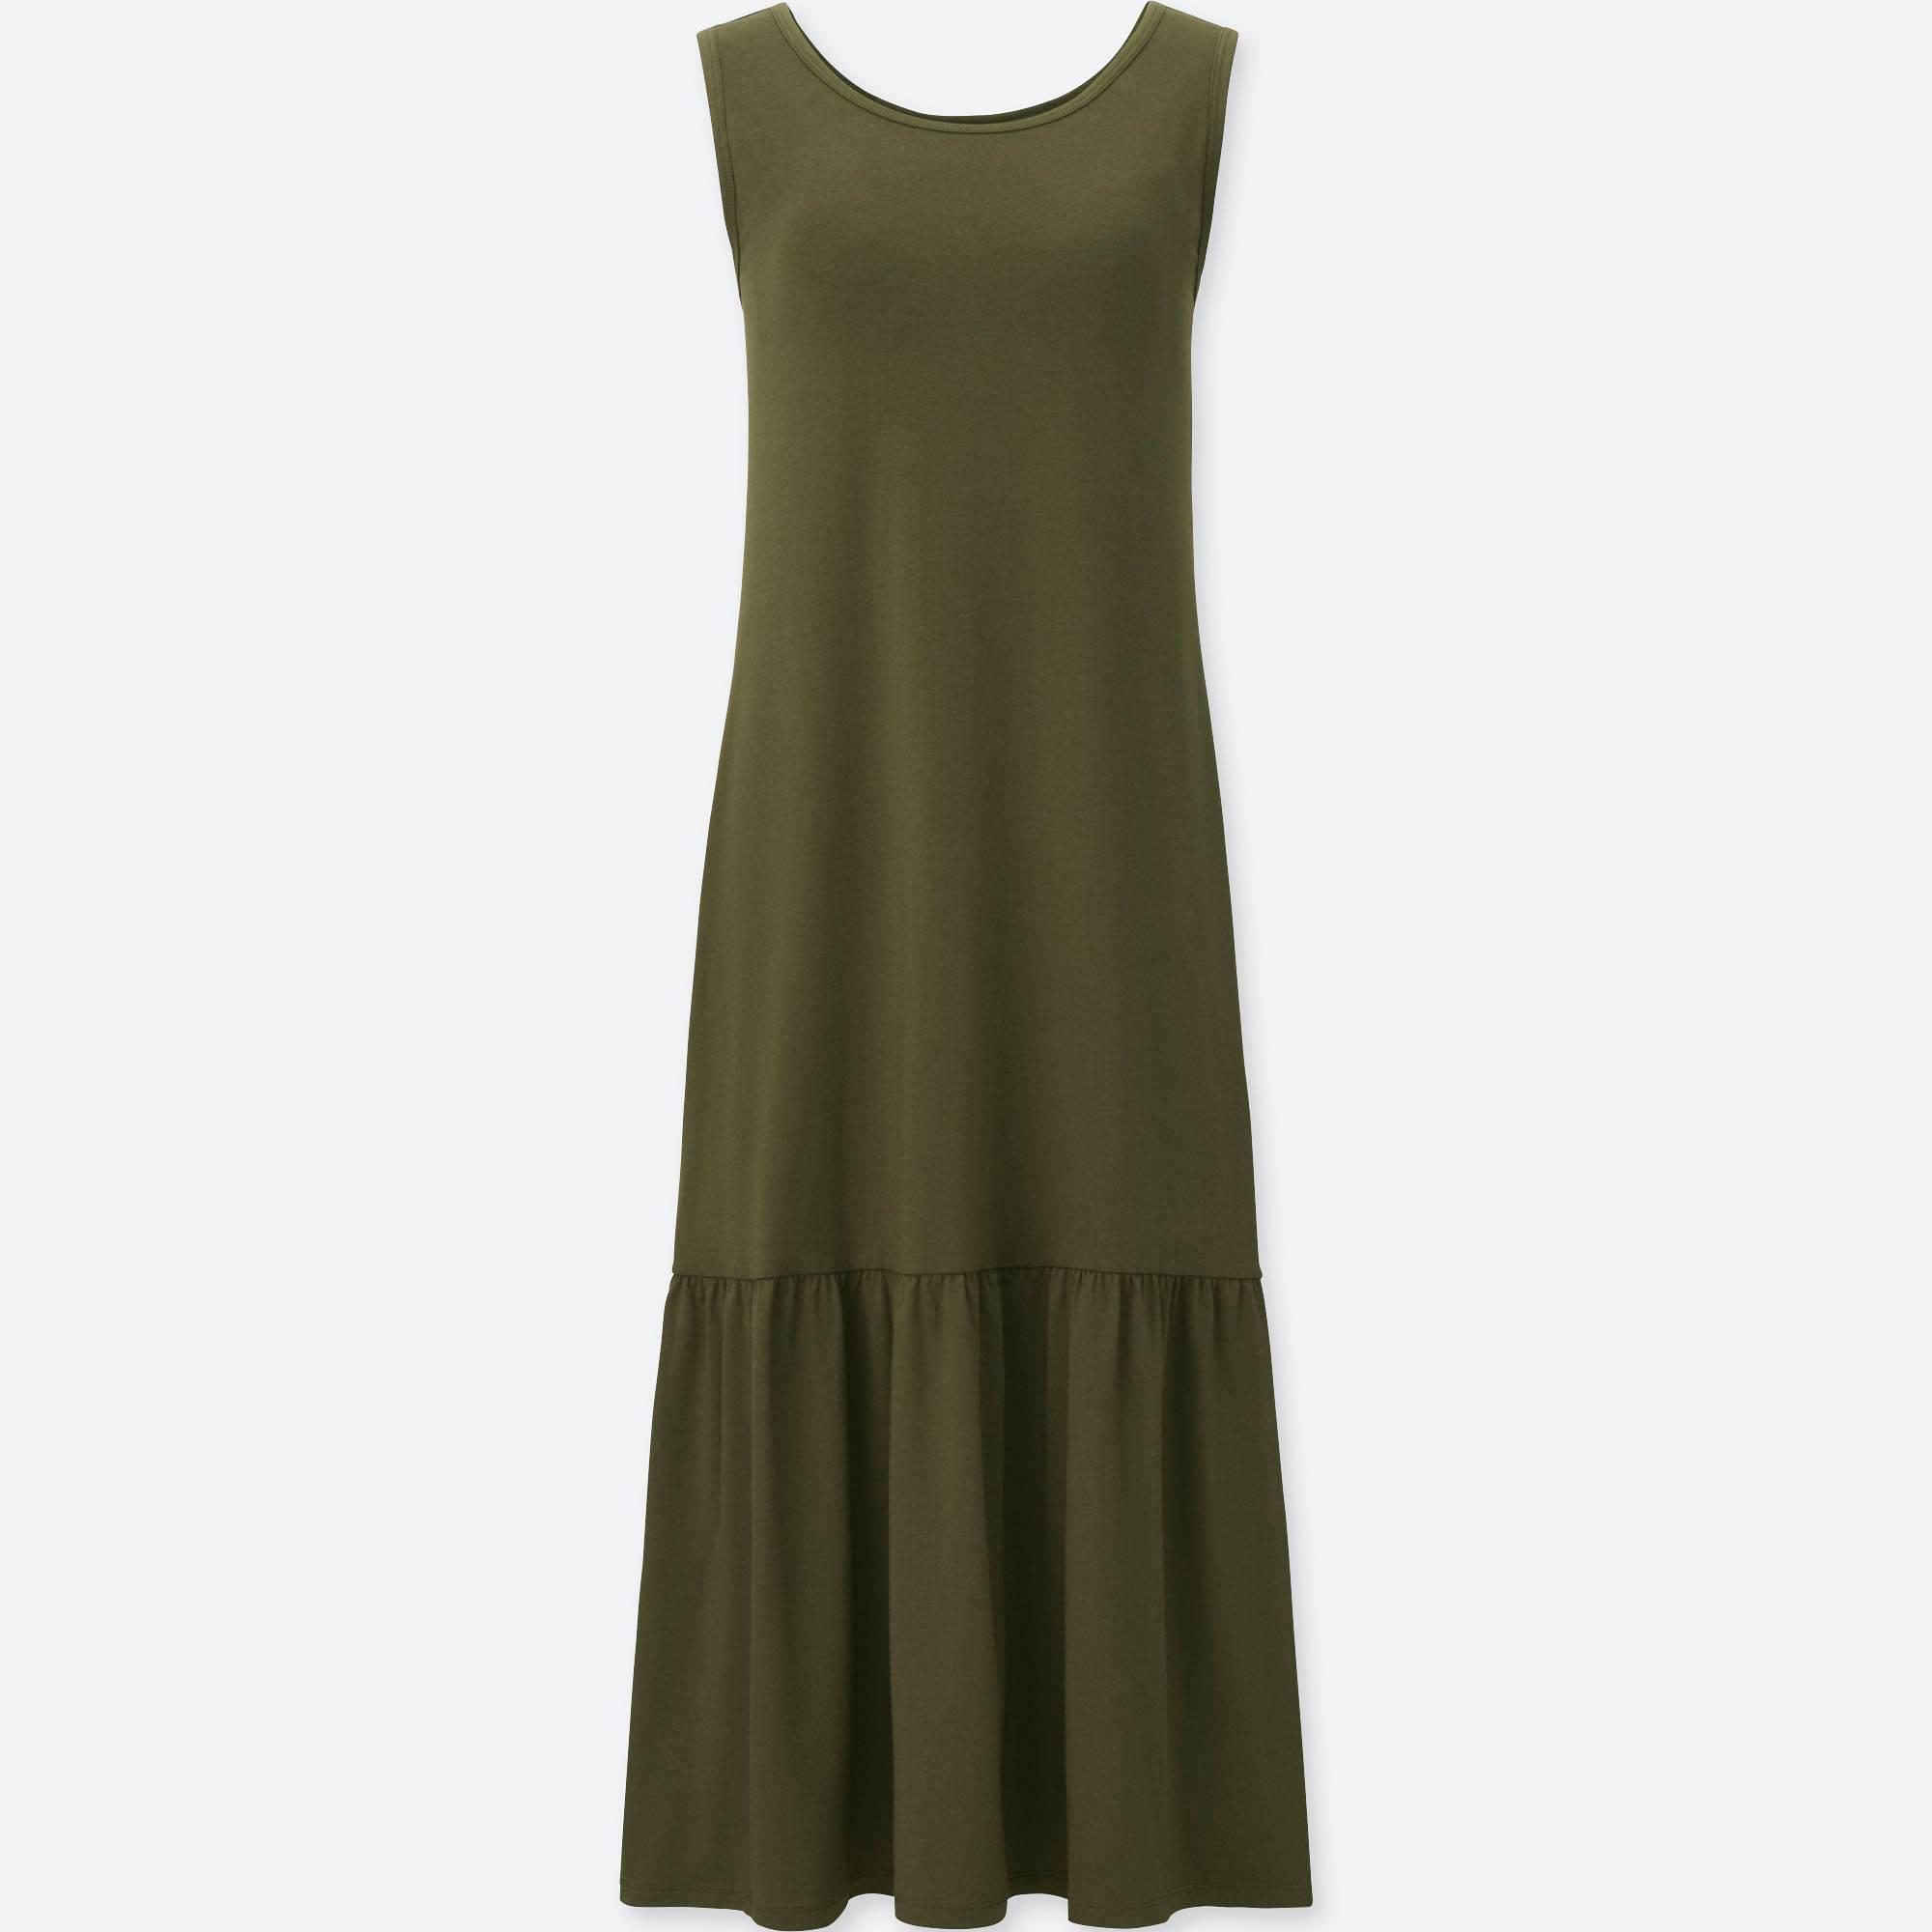 8f49932f4e Lyst - Uniqlo Flared Sleeveless Bra Dress in Green